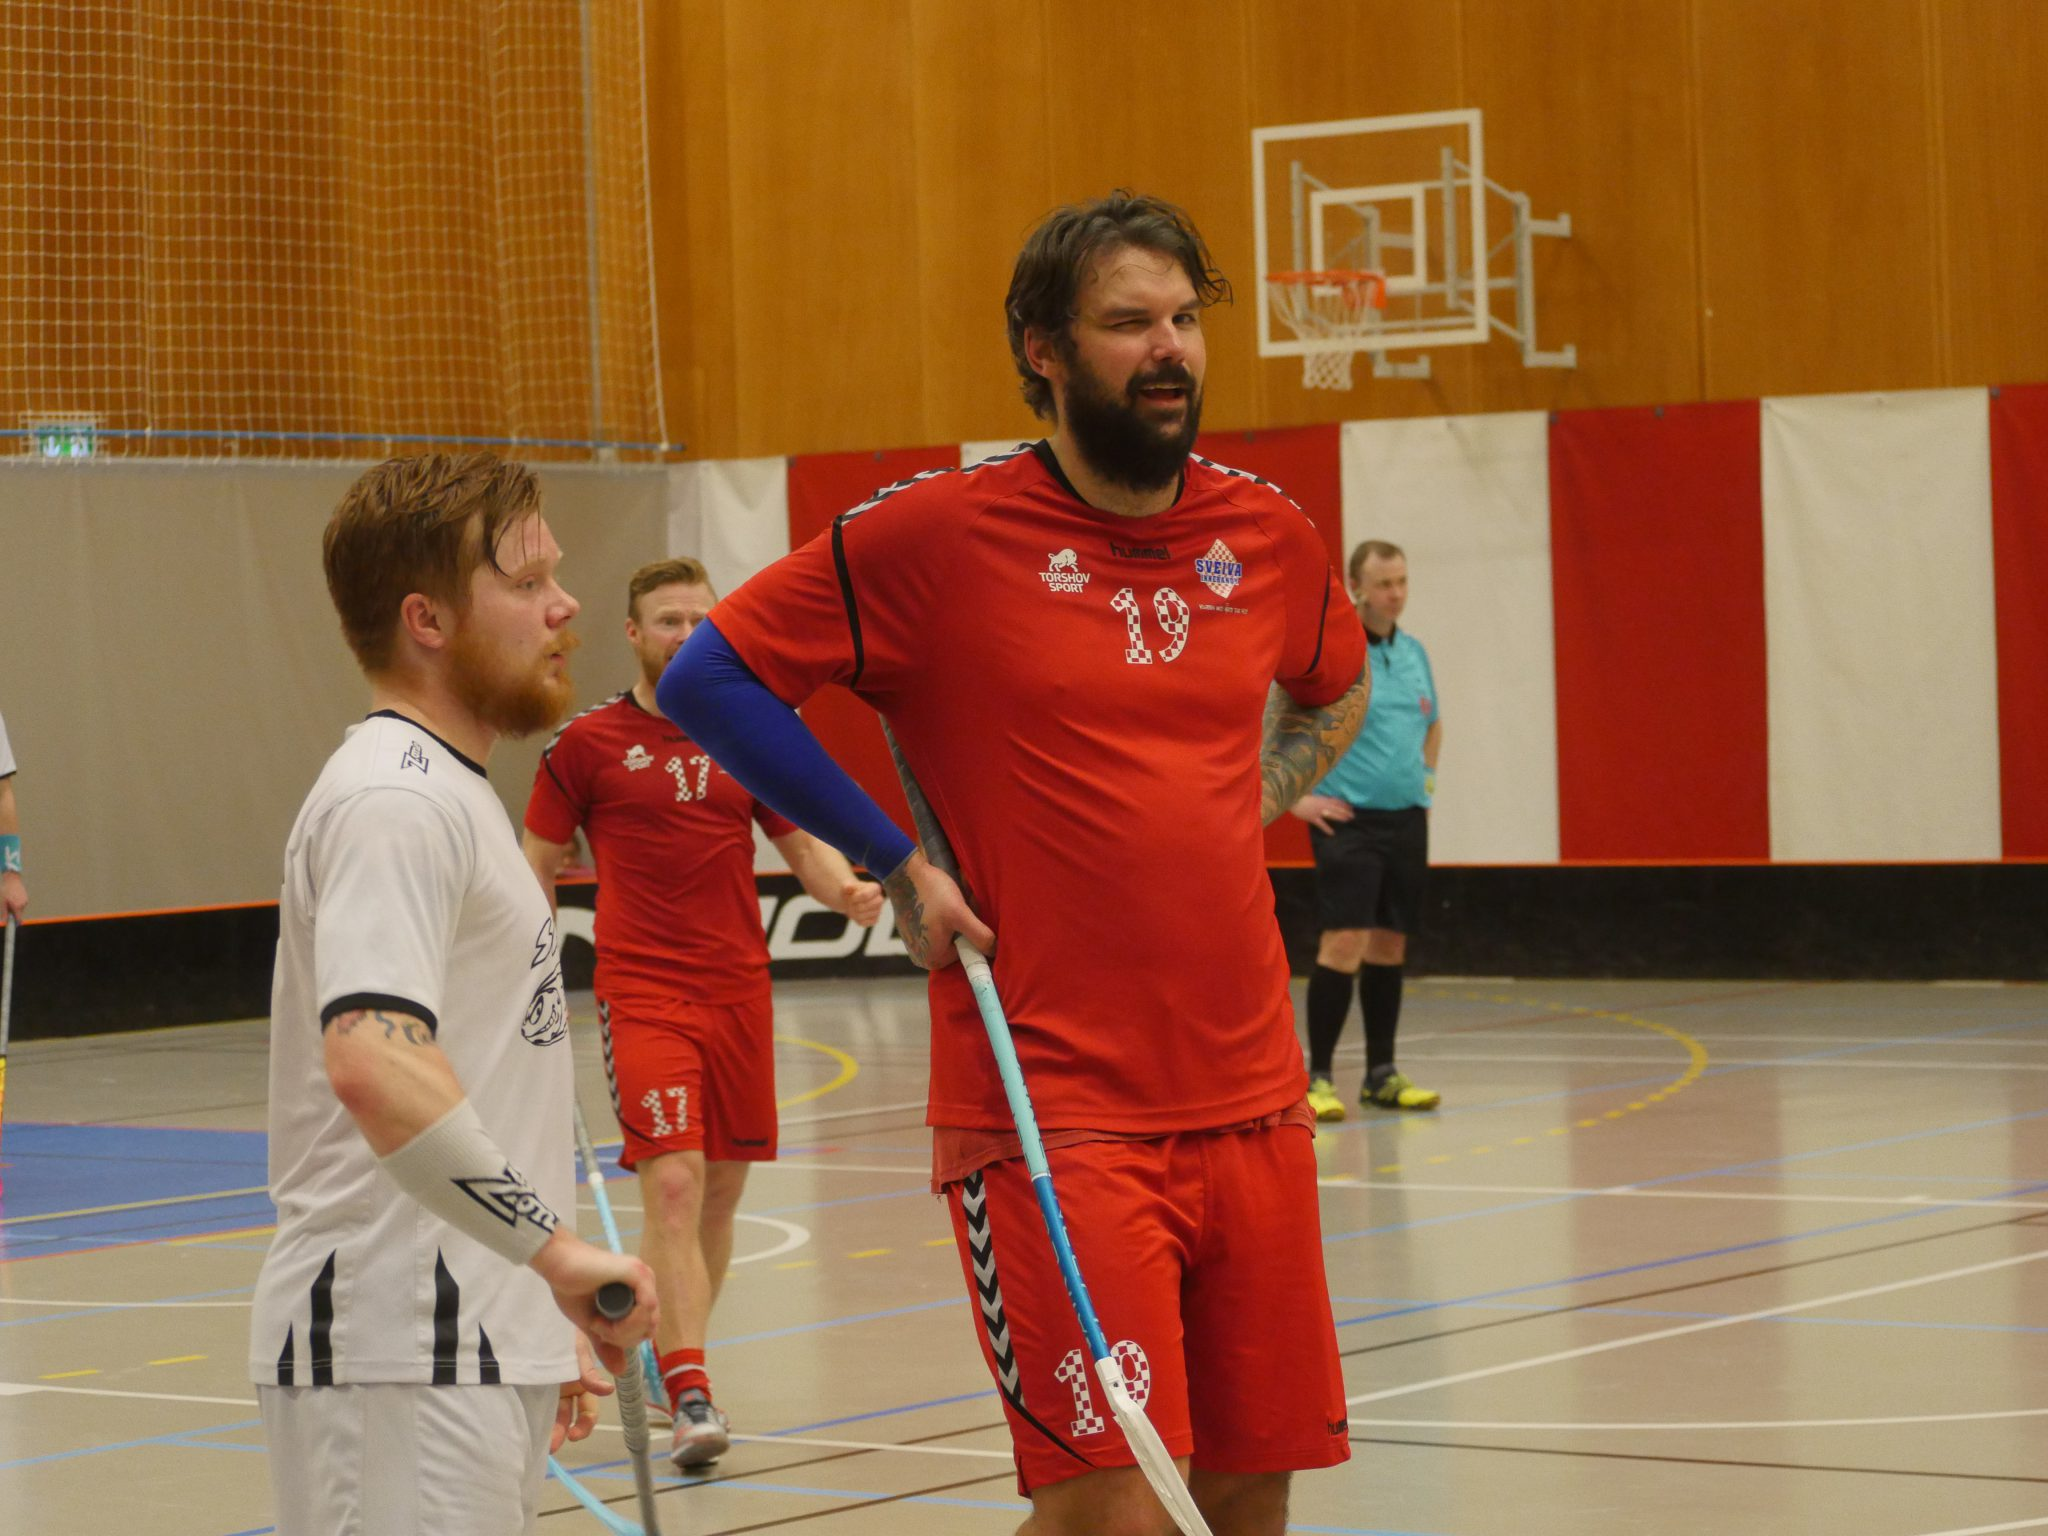 Greåker og Sveiva til finale